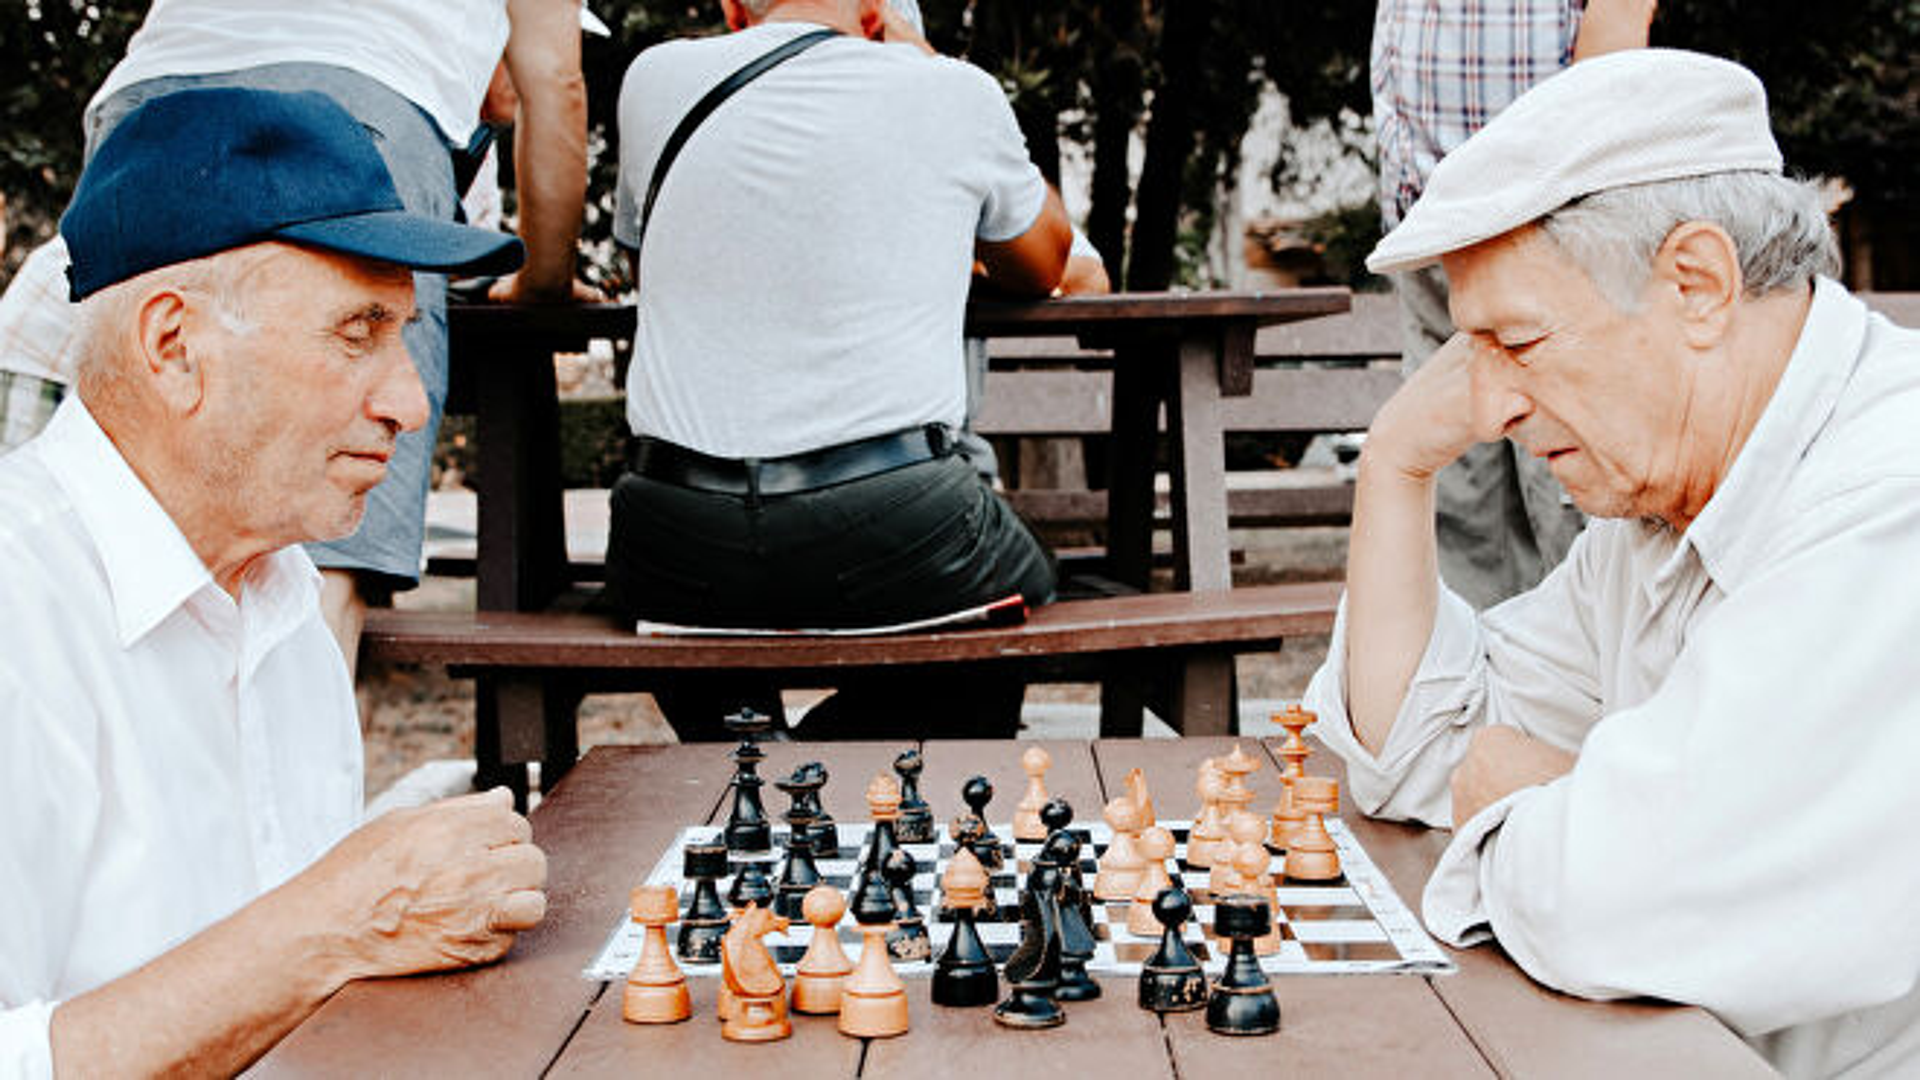 Two elderly men playing chess